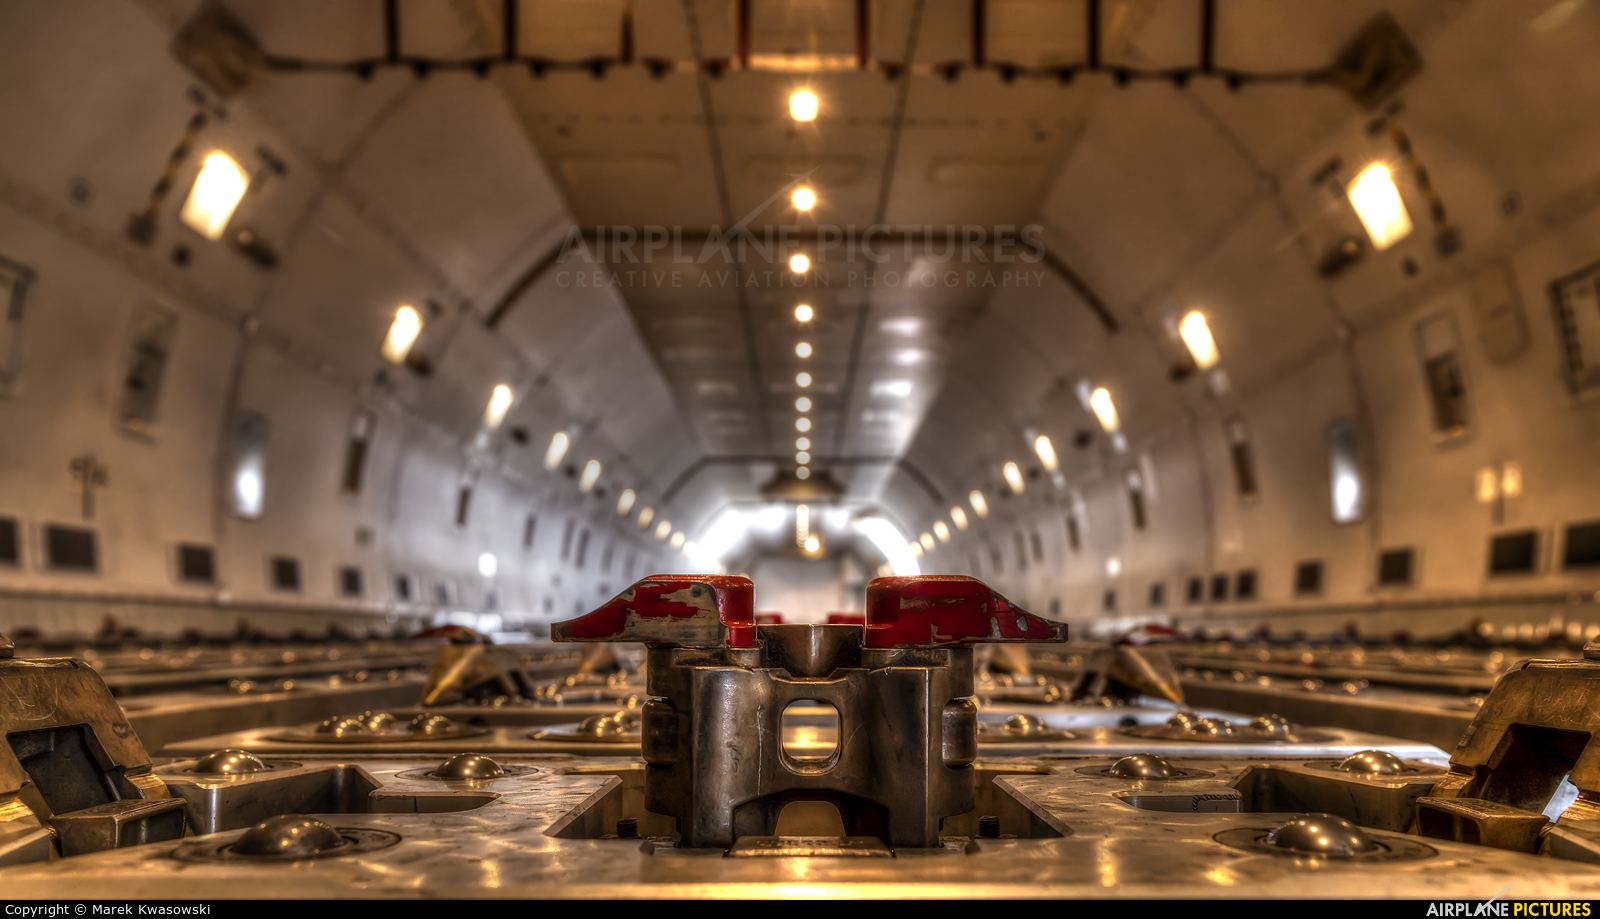 UPS - United Parcel Service N575UP aircraft at Warsaw - Frederic Chopin